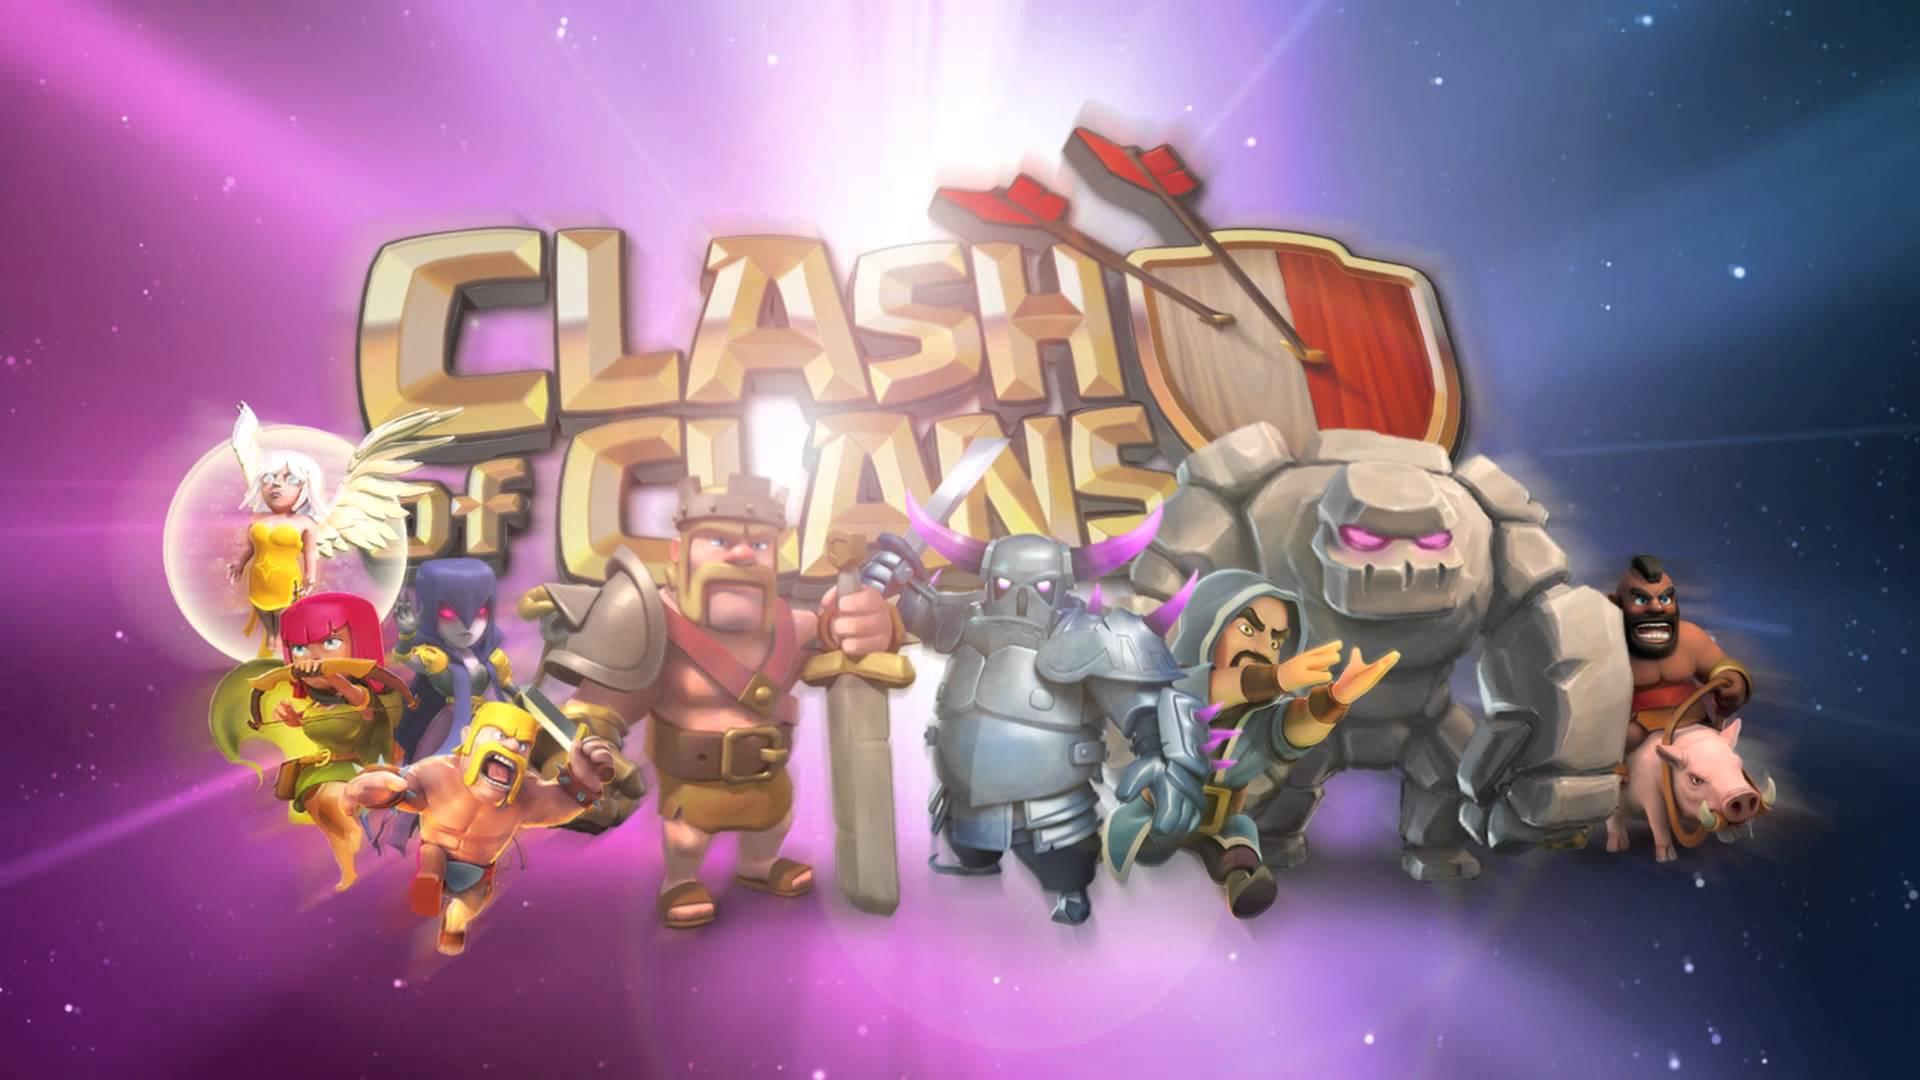 Clash of Clans :: HD Art, Wallpaper, Background, Channel Art ...